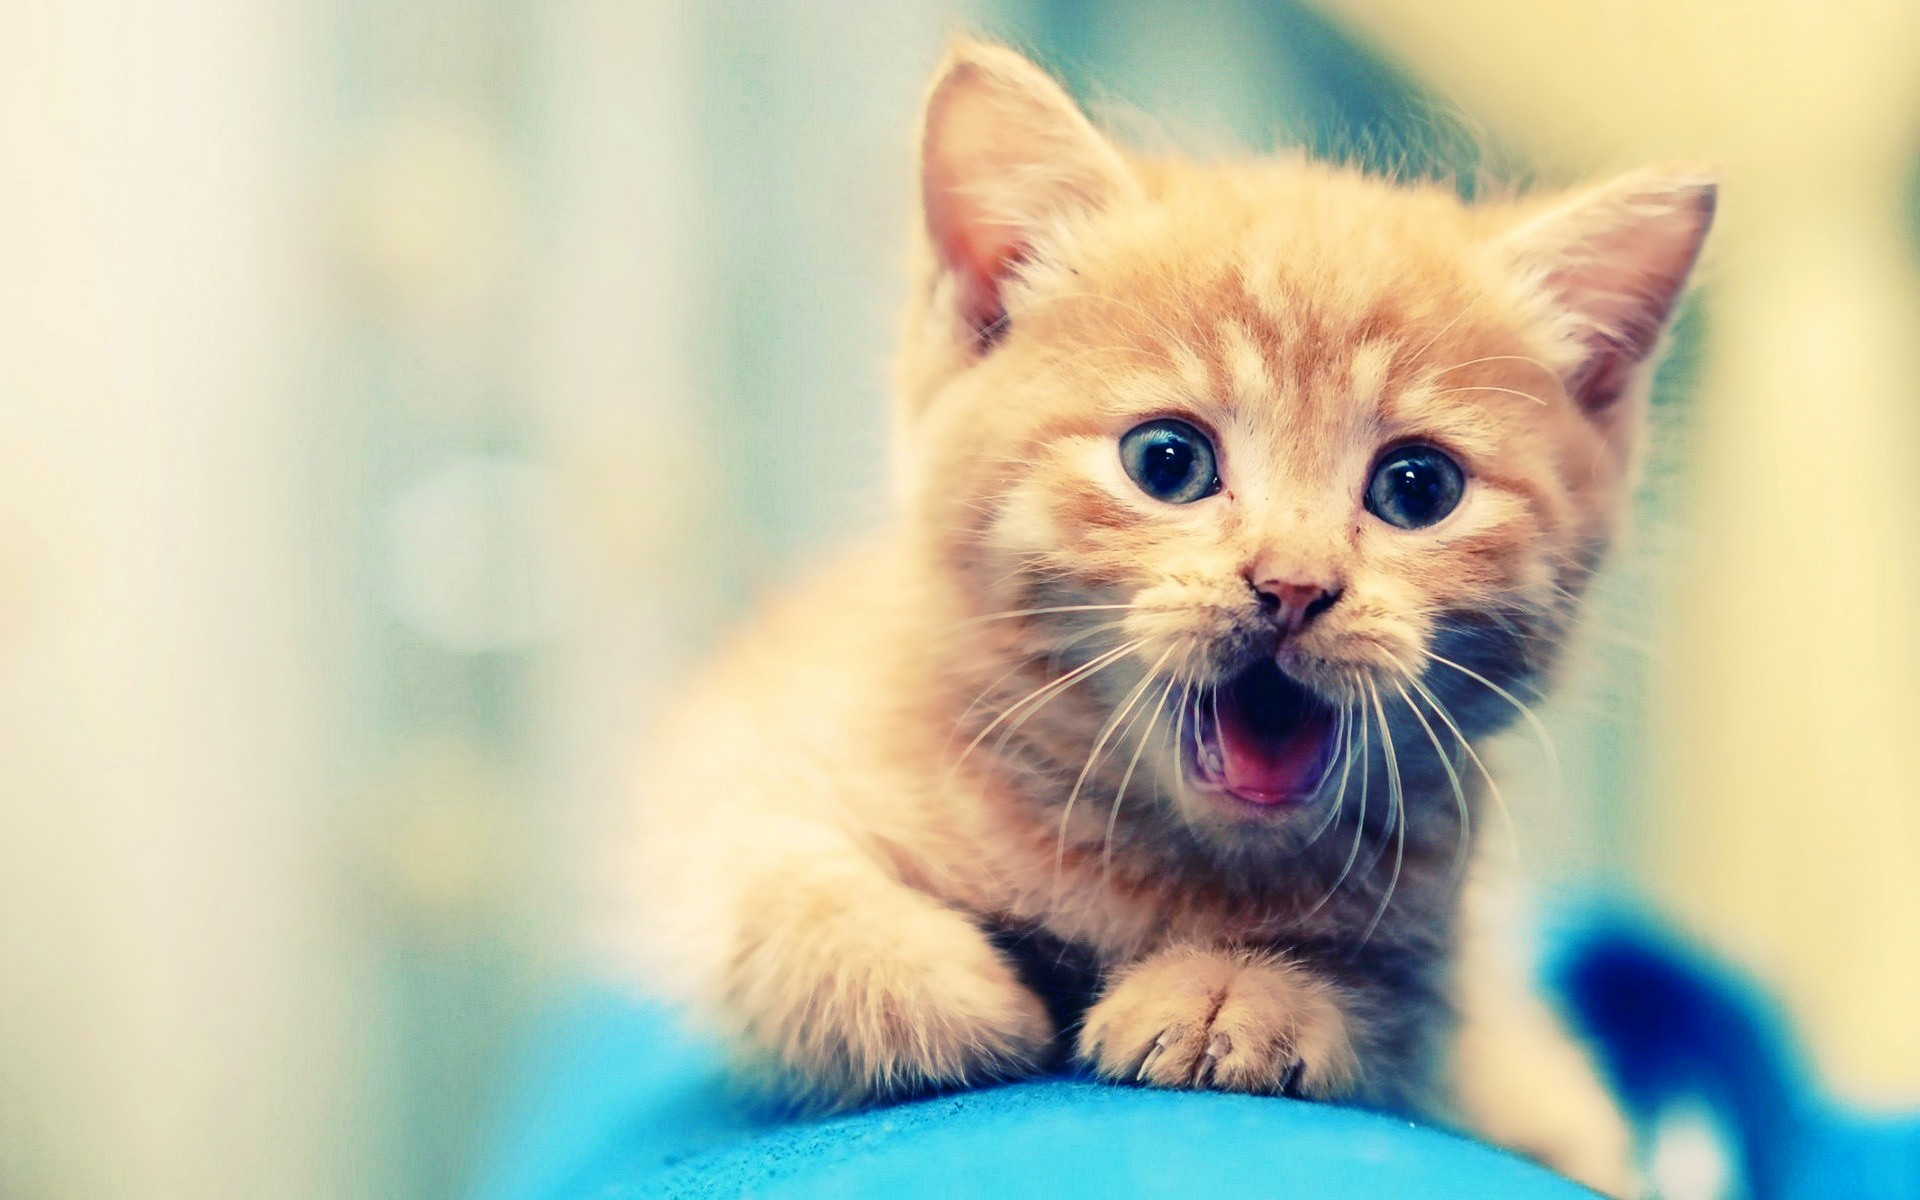 Kitten Wallpaper Phone